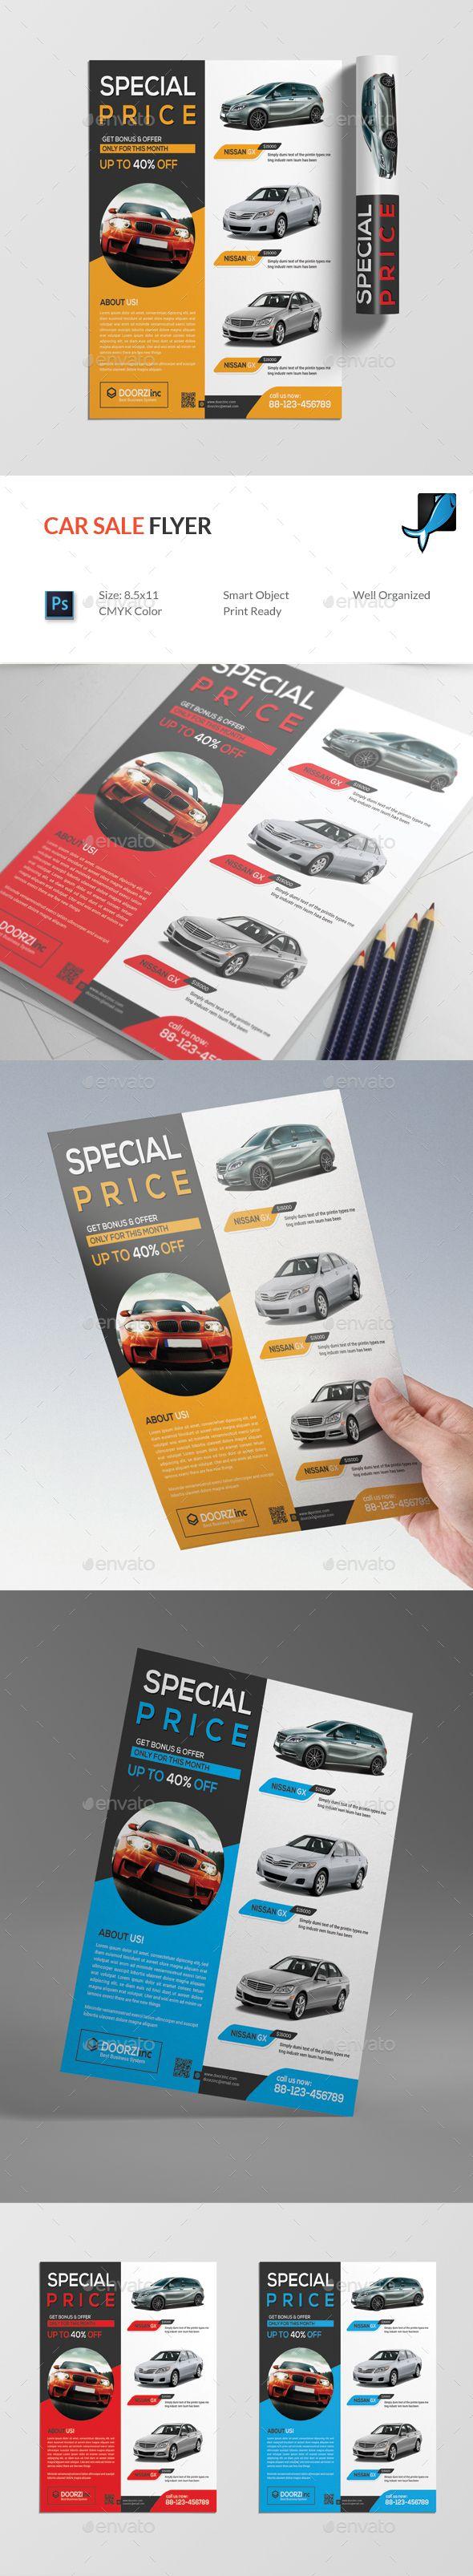 #Car Sale #Flyer - Commerce Flyers Download here: https://graphicriver.net/item/car-sale-flyer/19529147?ref=alena994